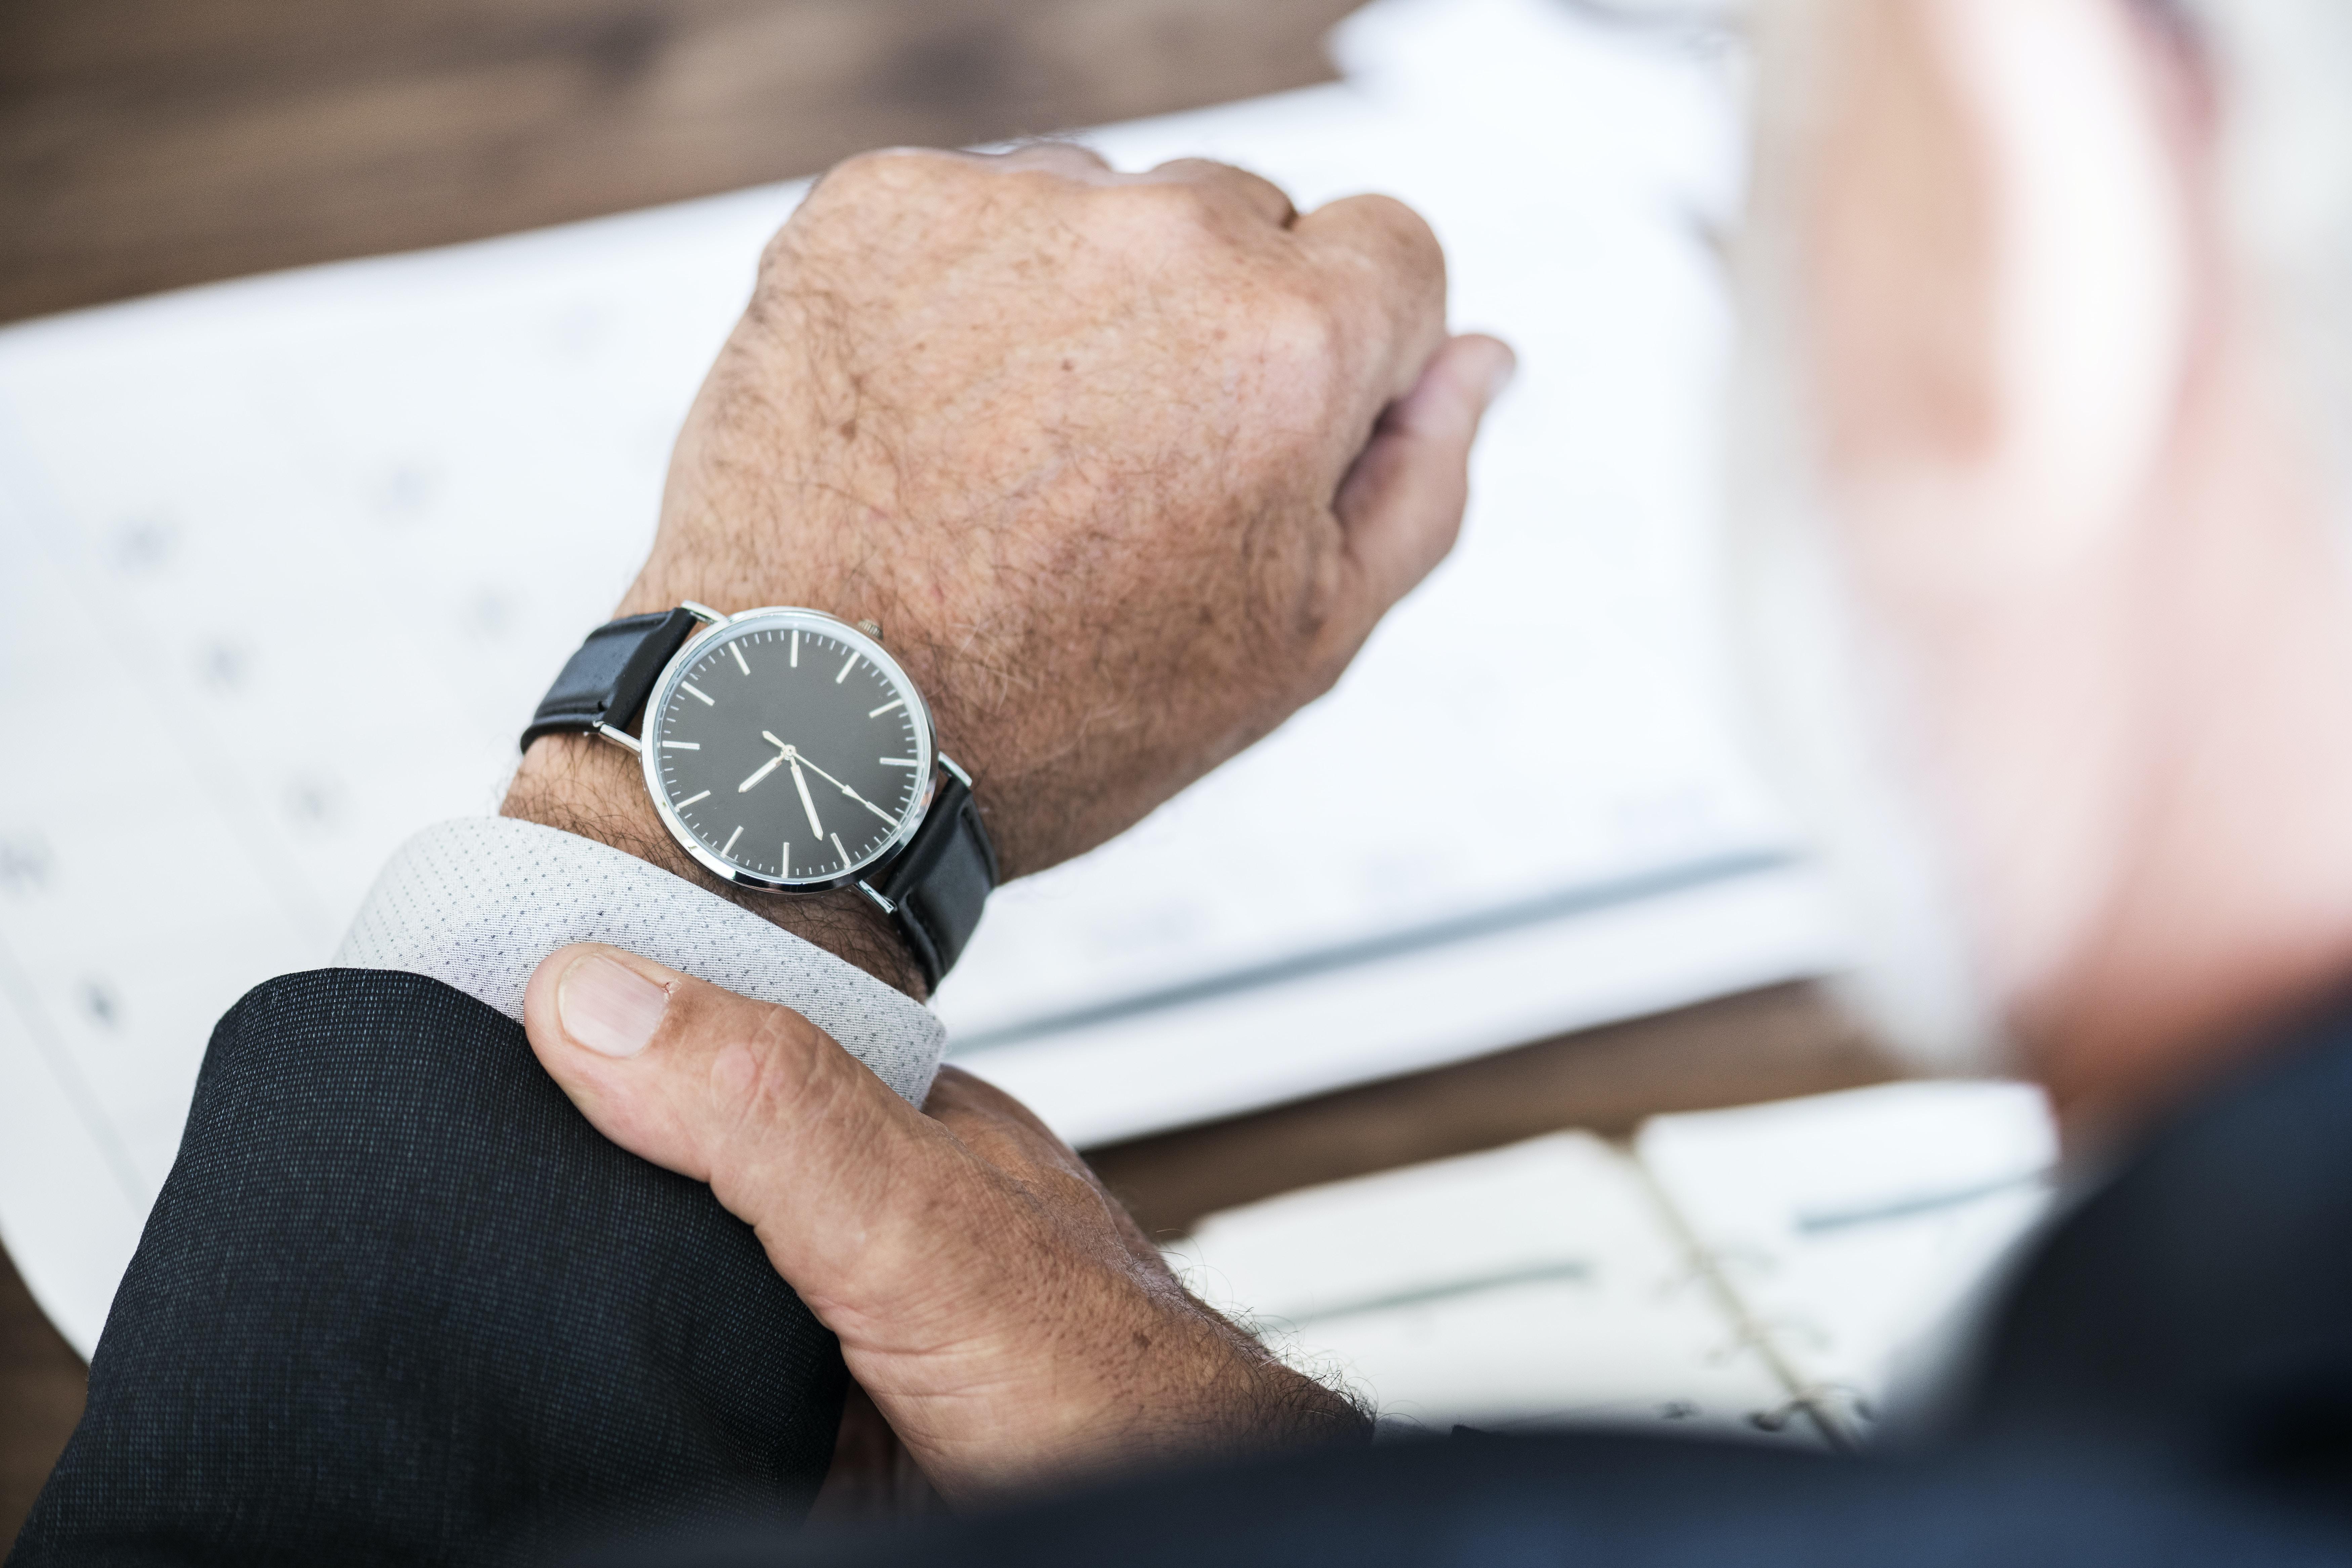 man wearing round watch at 9:36